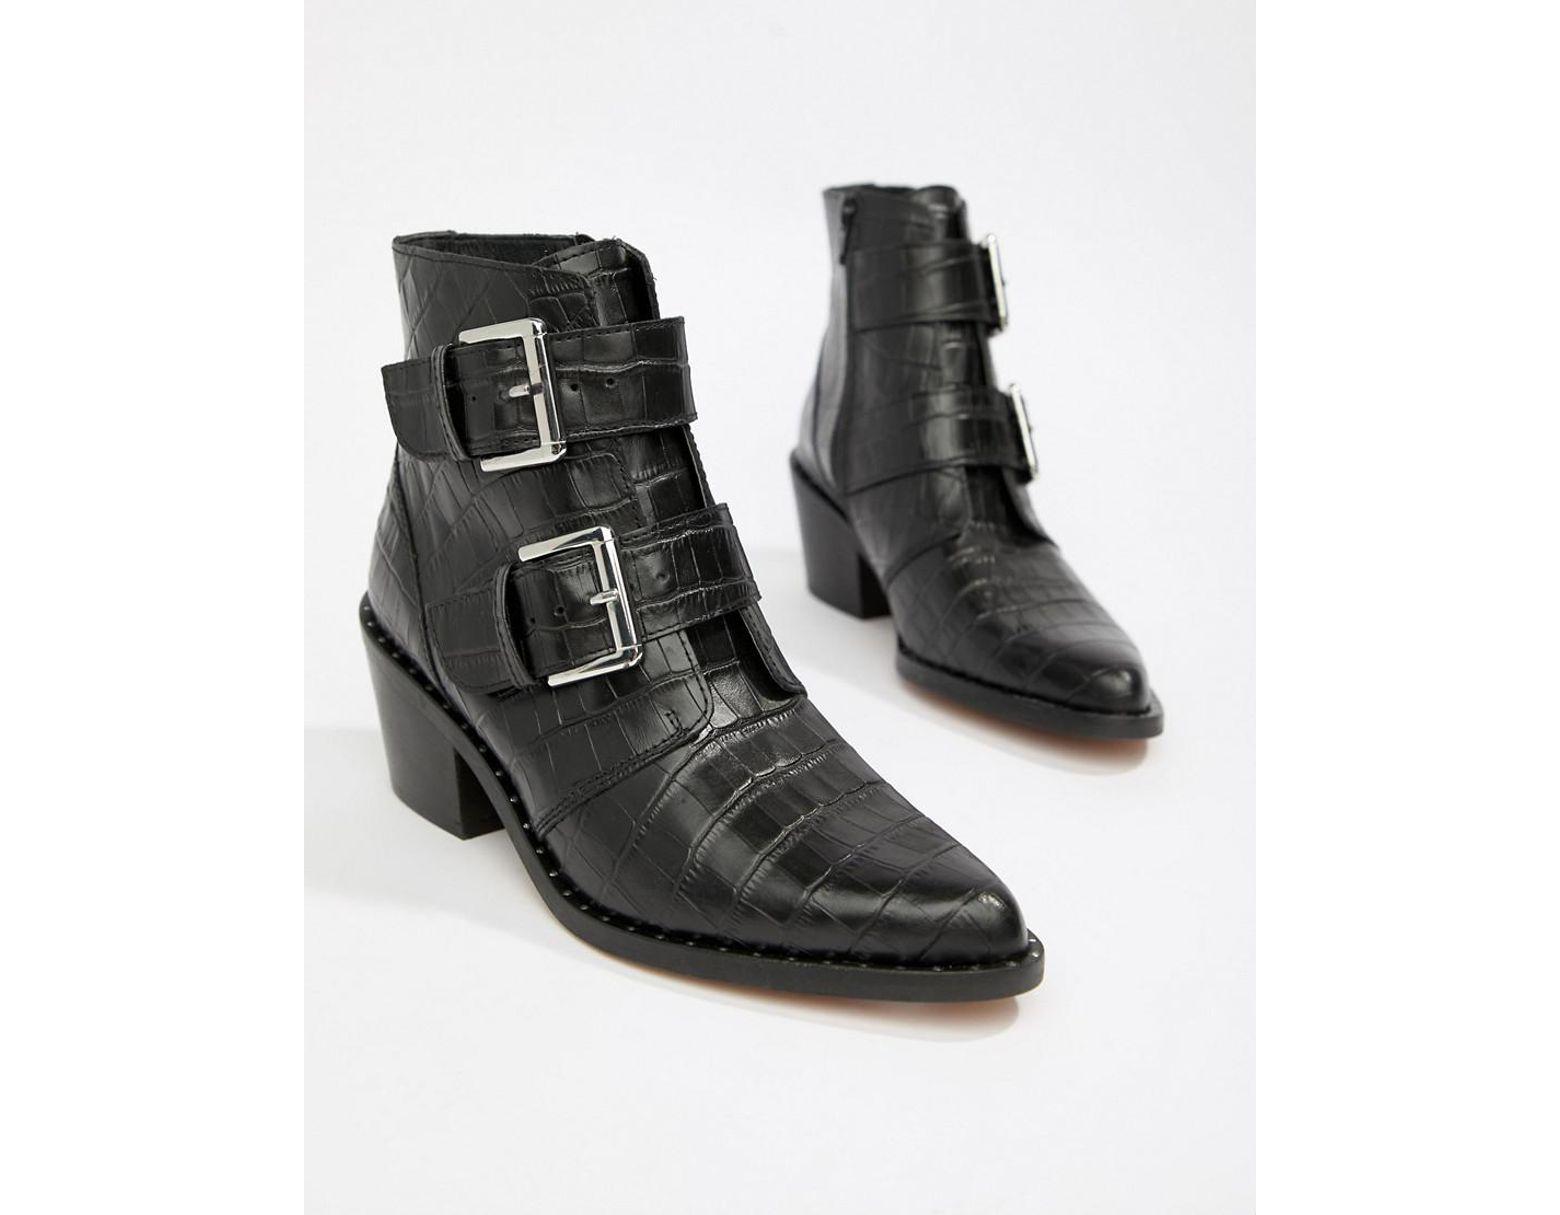 05e7ed51289e6 Kurt Geiger Denny Boots in Black - Save 30% - Lyst